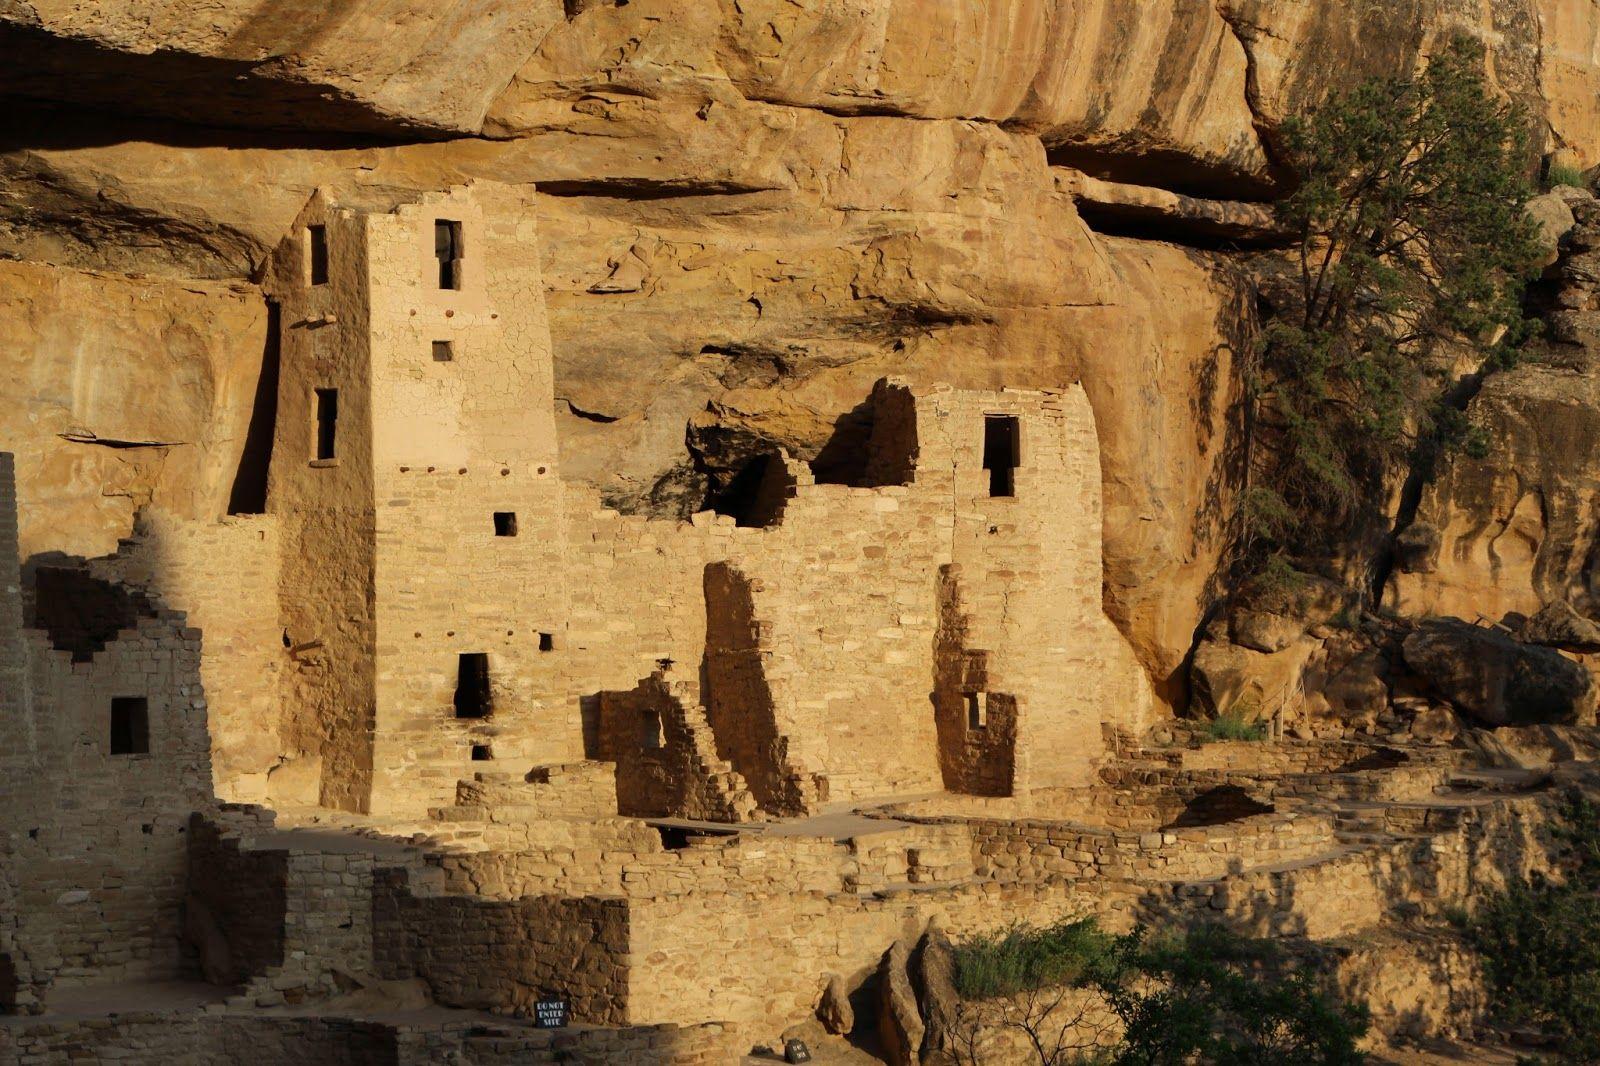 Mesa Verde National Park - Colorado 4.bp.blogspot.com -6iGdgZpxEUM V41JKn4JZVI AAAAAAAAGg4 uvZZEUOas6QYJlk8OFMVyvftTt8kvH8_QCLcB s1600 IMG_4690.JPG